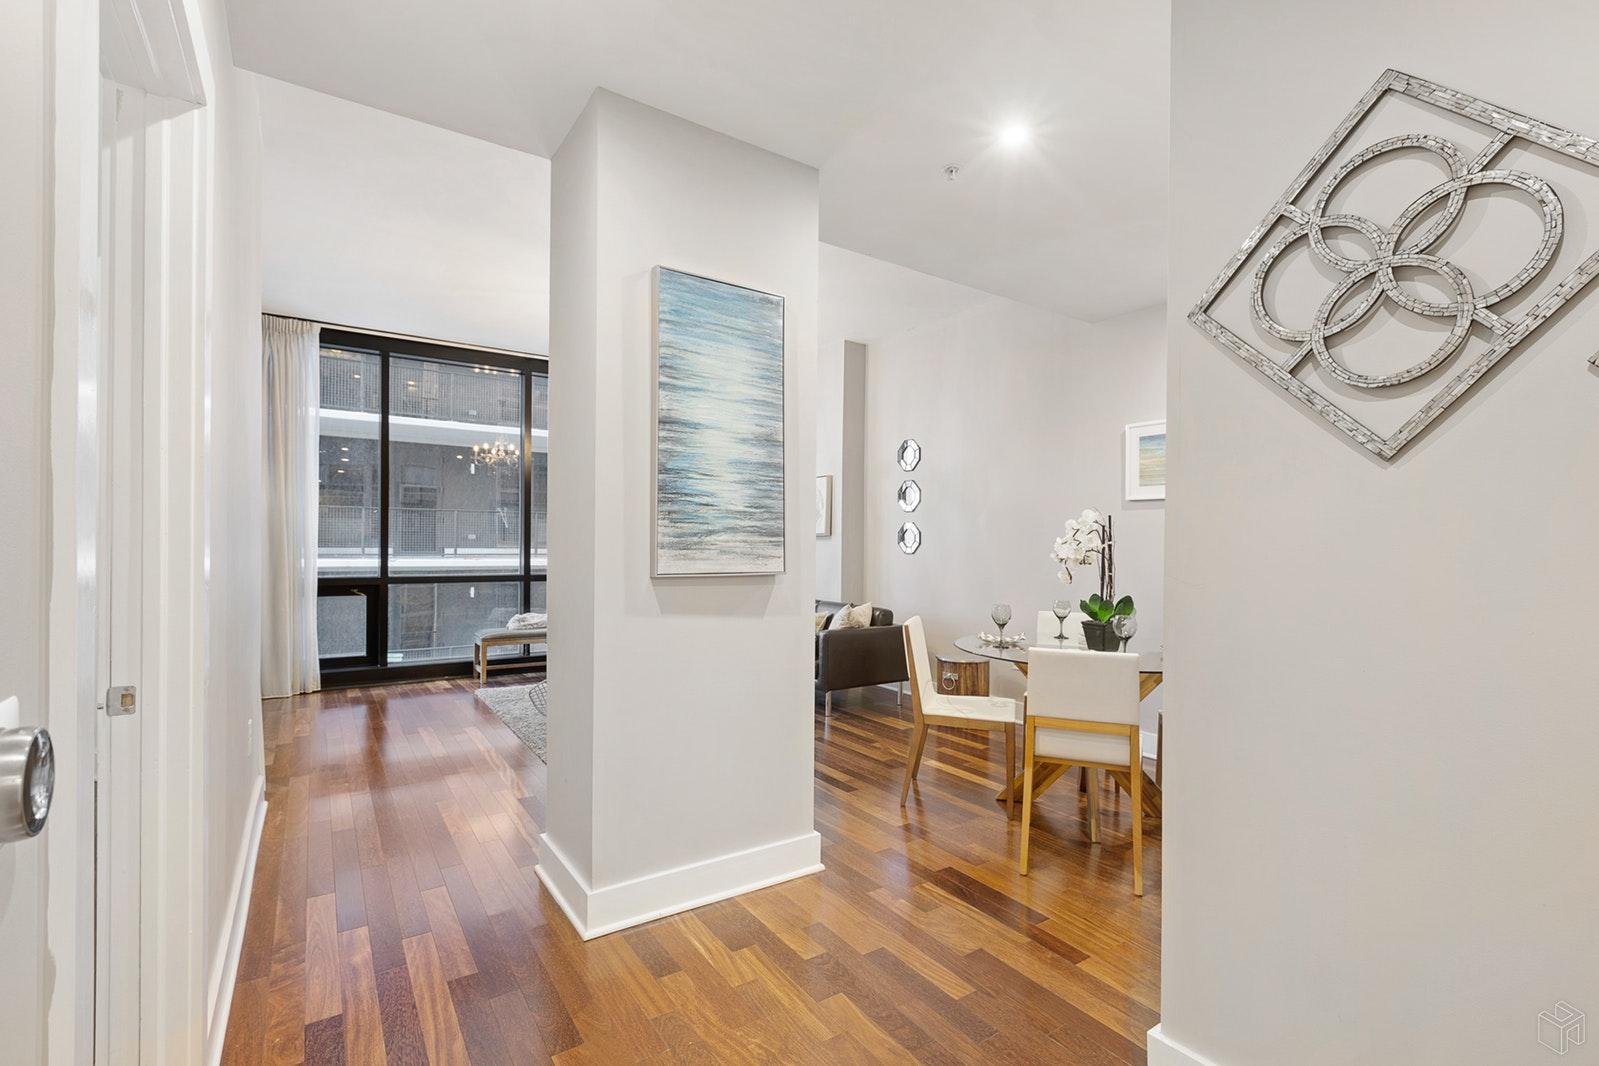 159 2ND ST 402, Jersey City Downtown, $695,000, Web #: 19258443